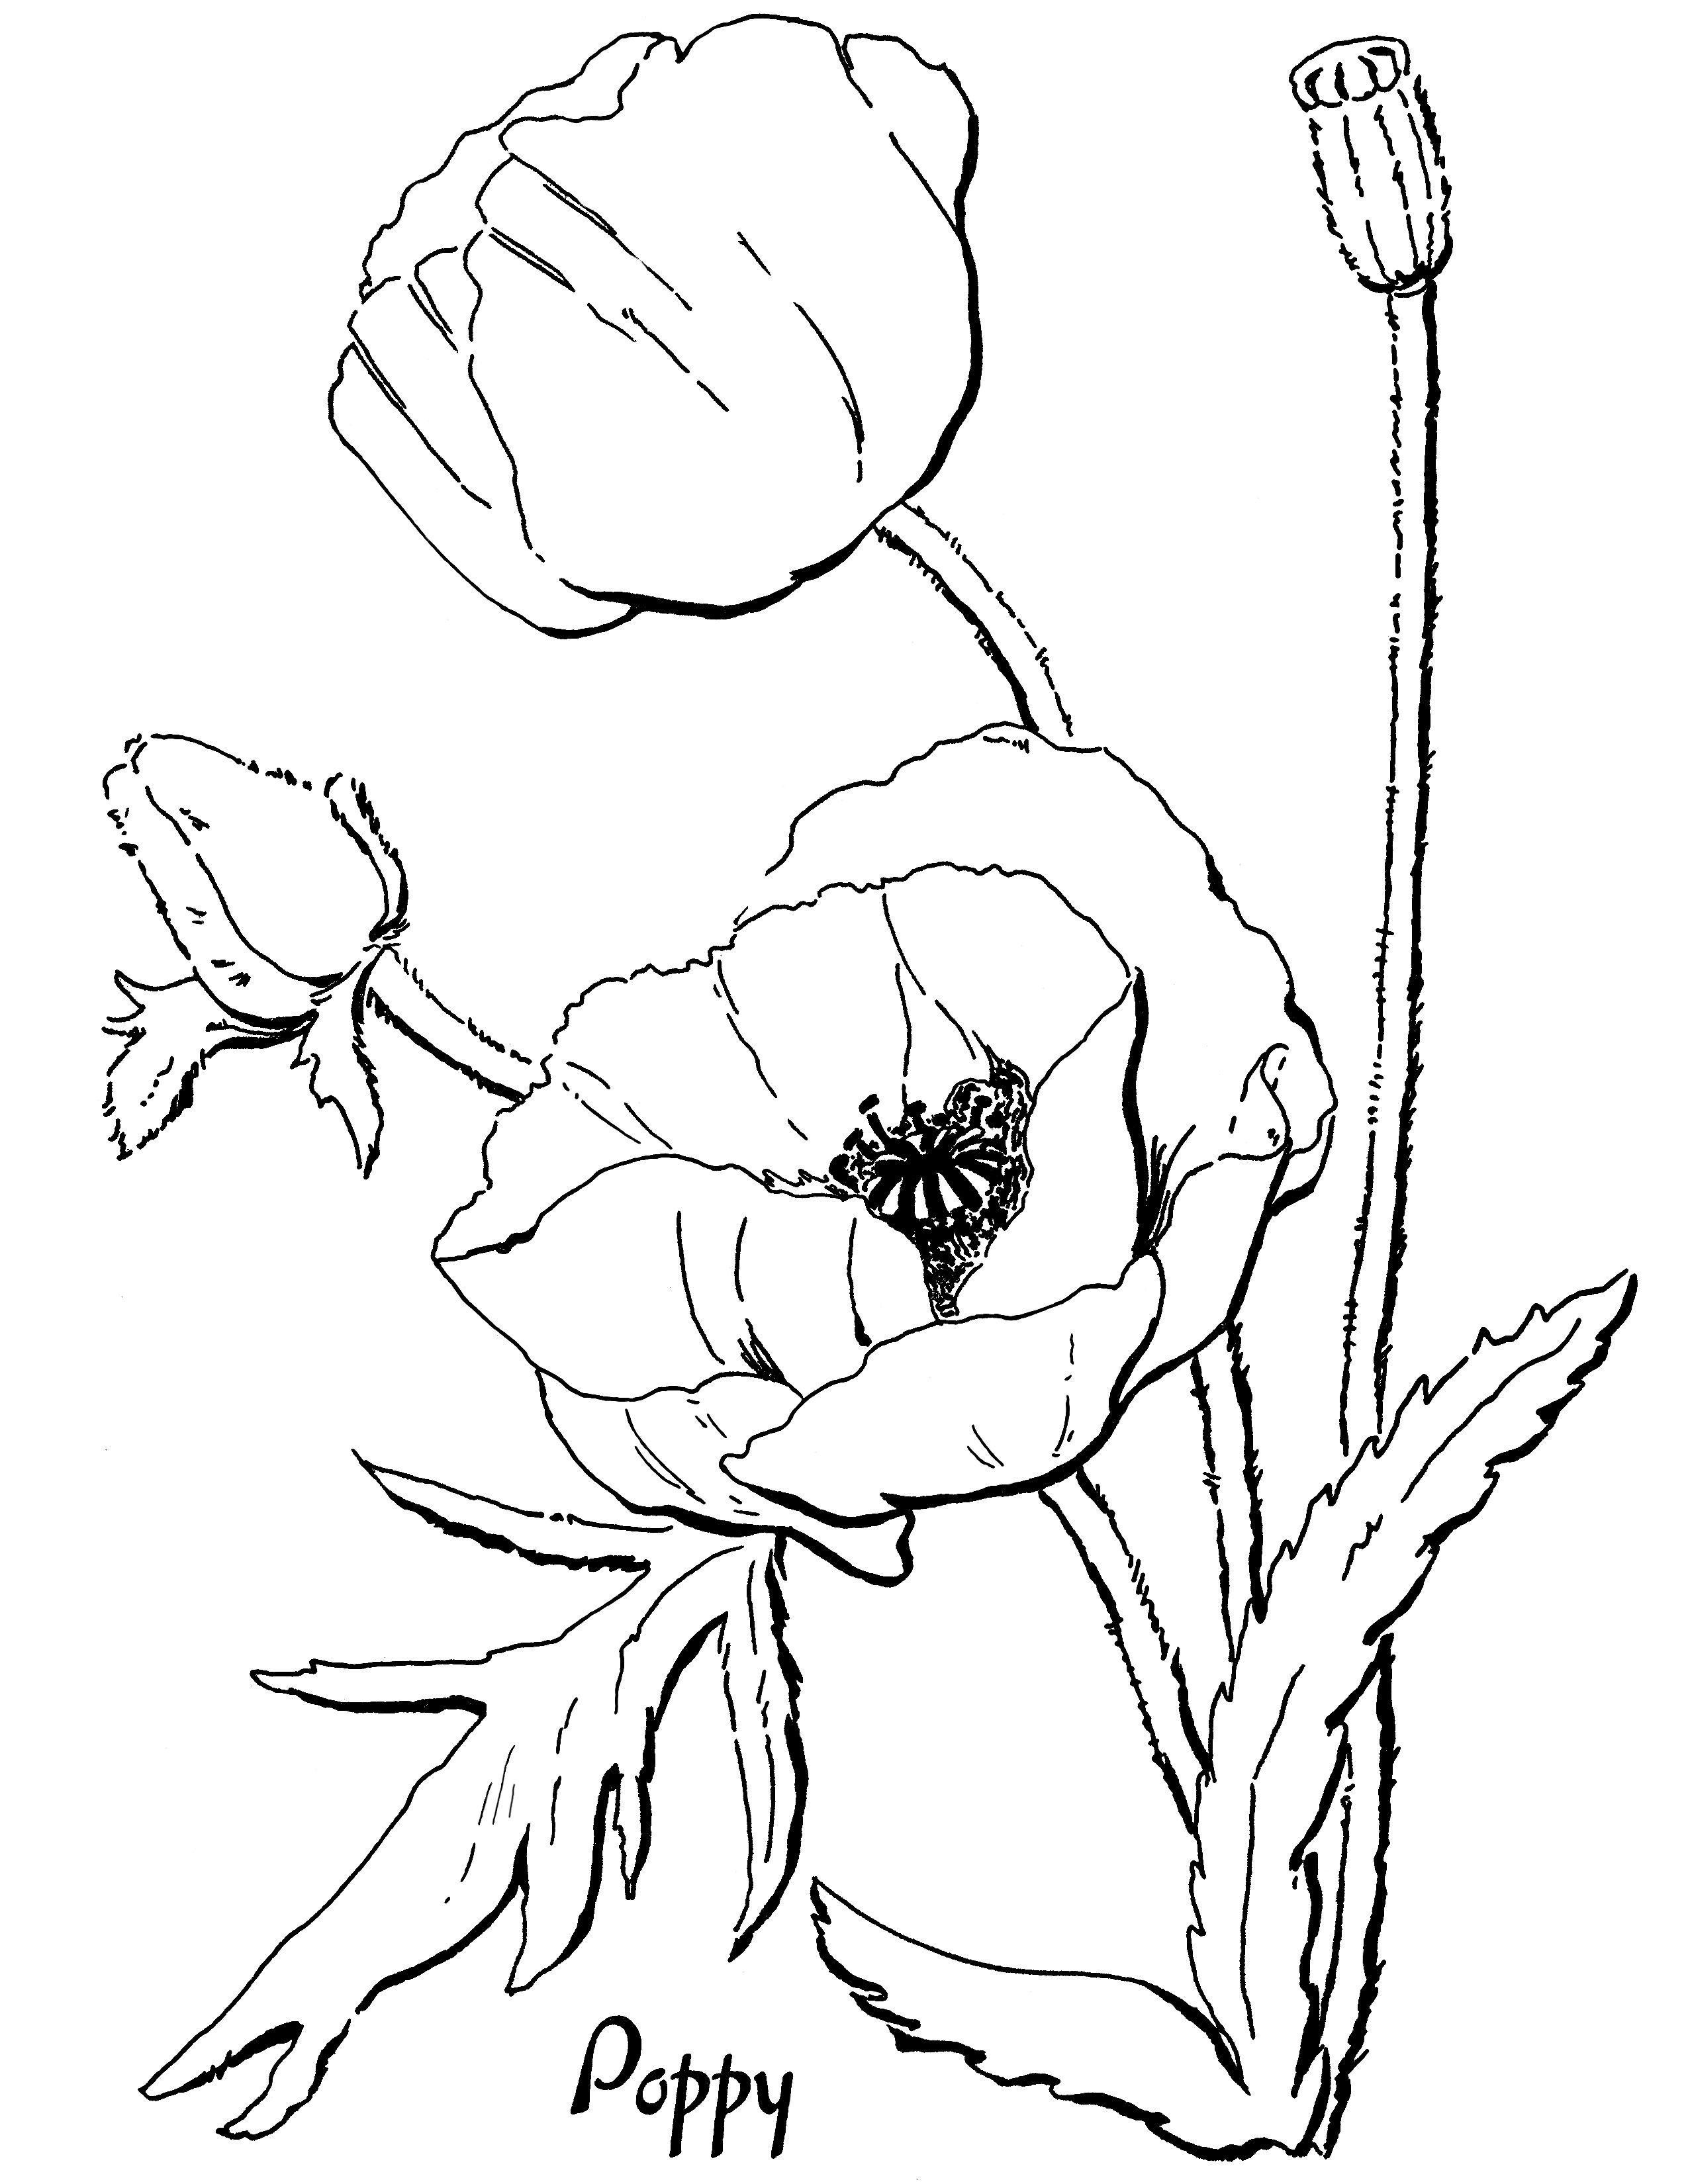 Pin By Inguna Kalnina On Izsuvumi Poppy Coloring Page Vintage